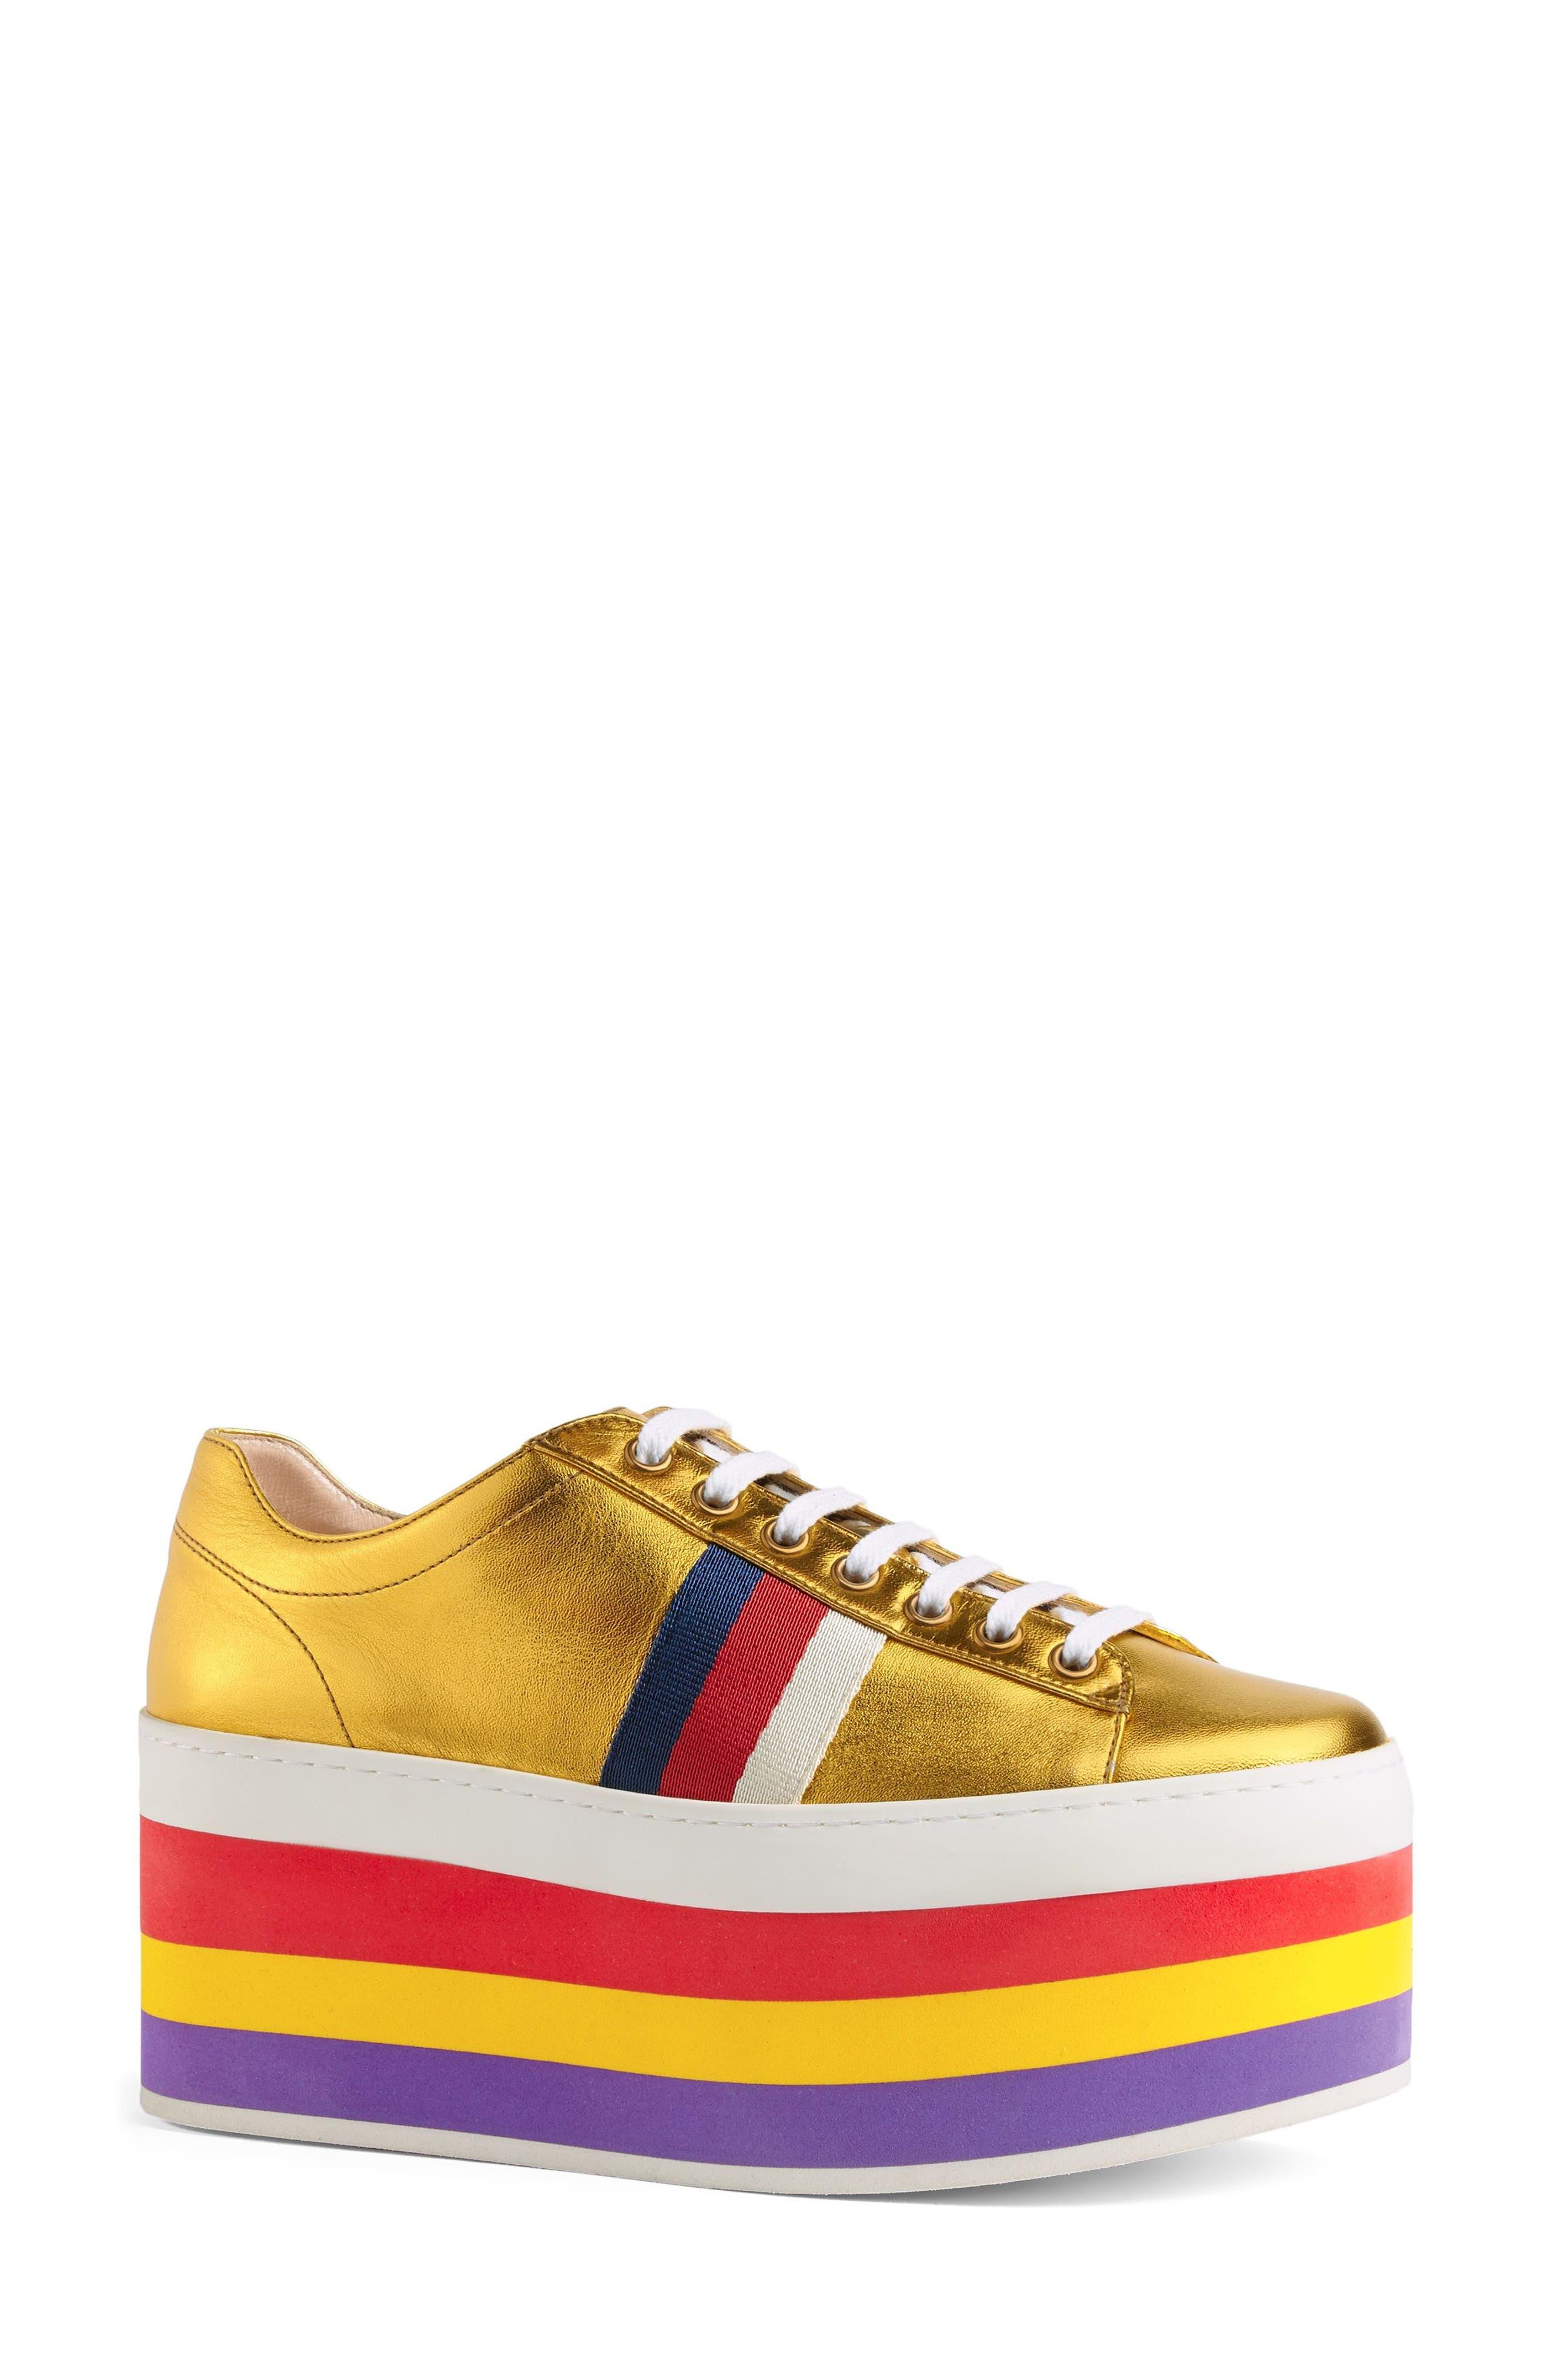 Alternate Image 2  - Gucci Peggy Flatform Sneaker (Women)